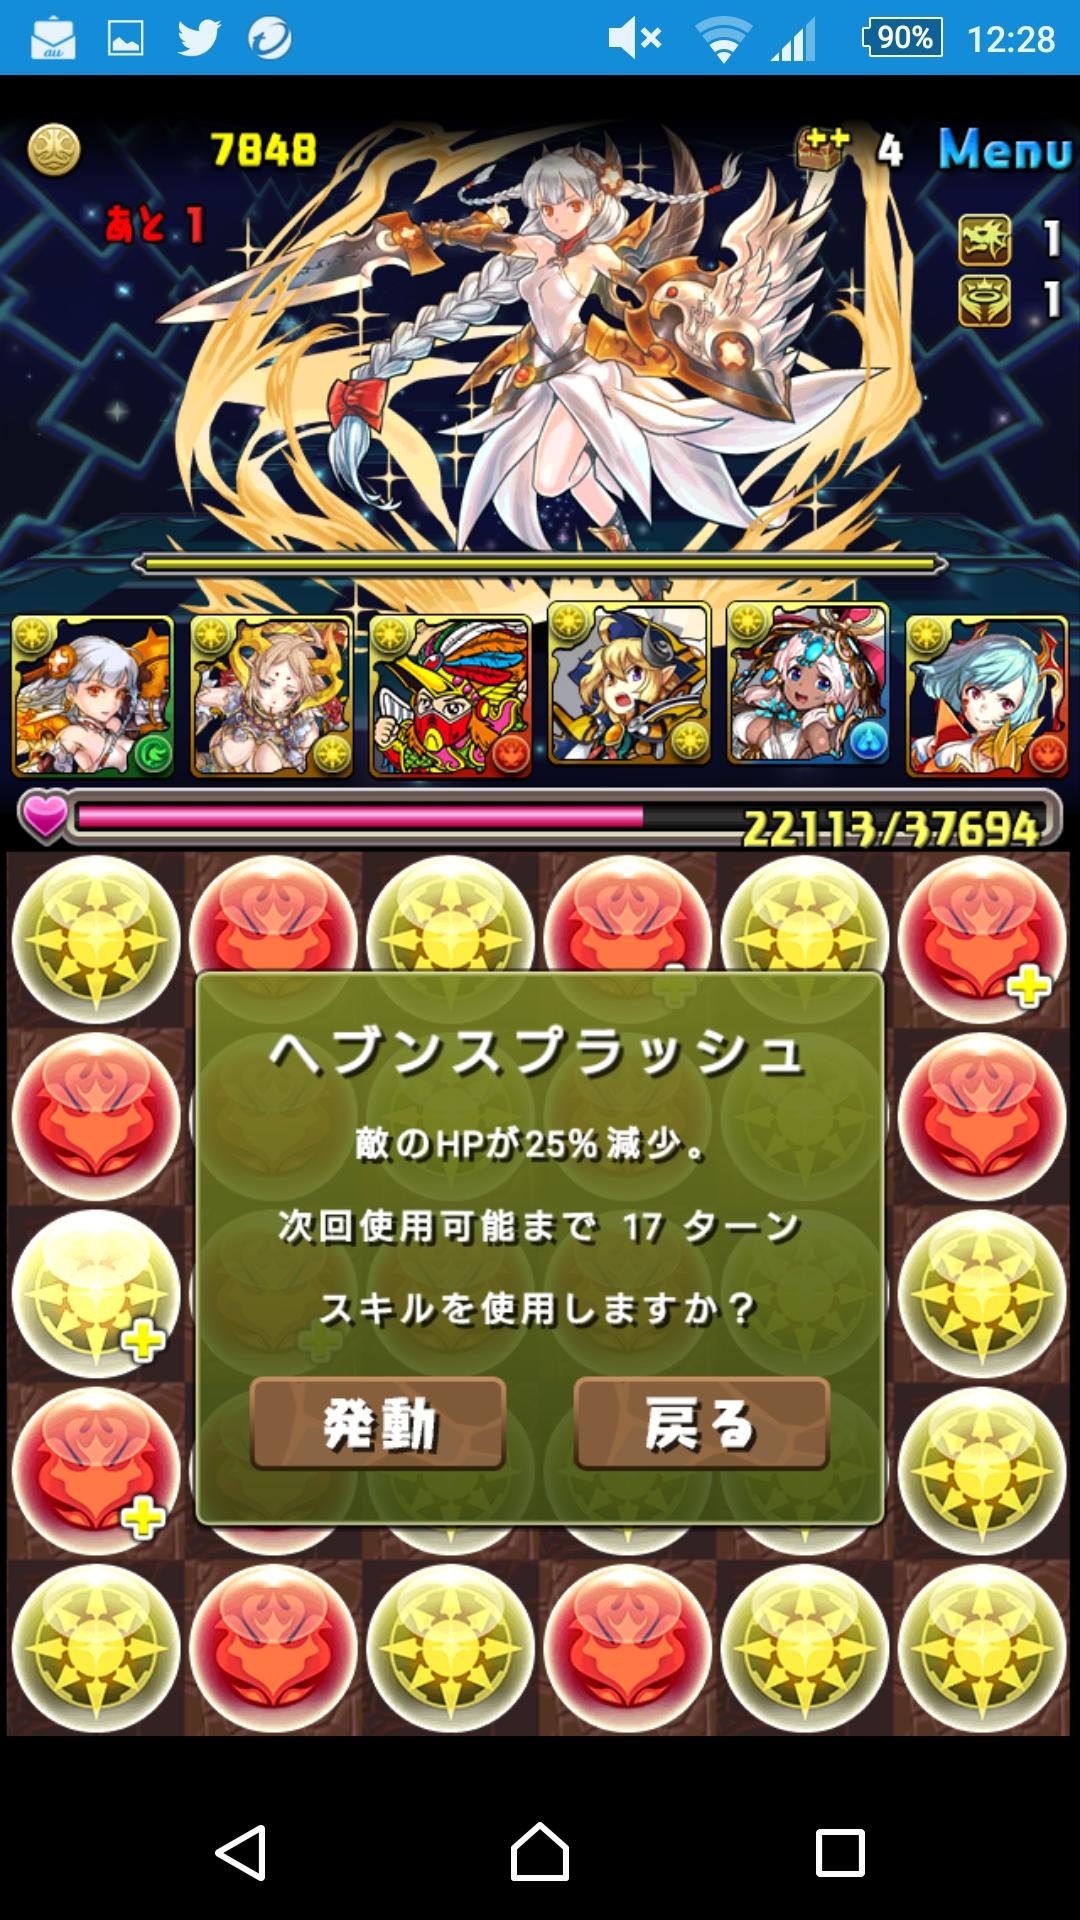 Screenshot_2016-03-10-12-28-46.png